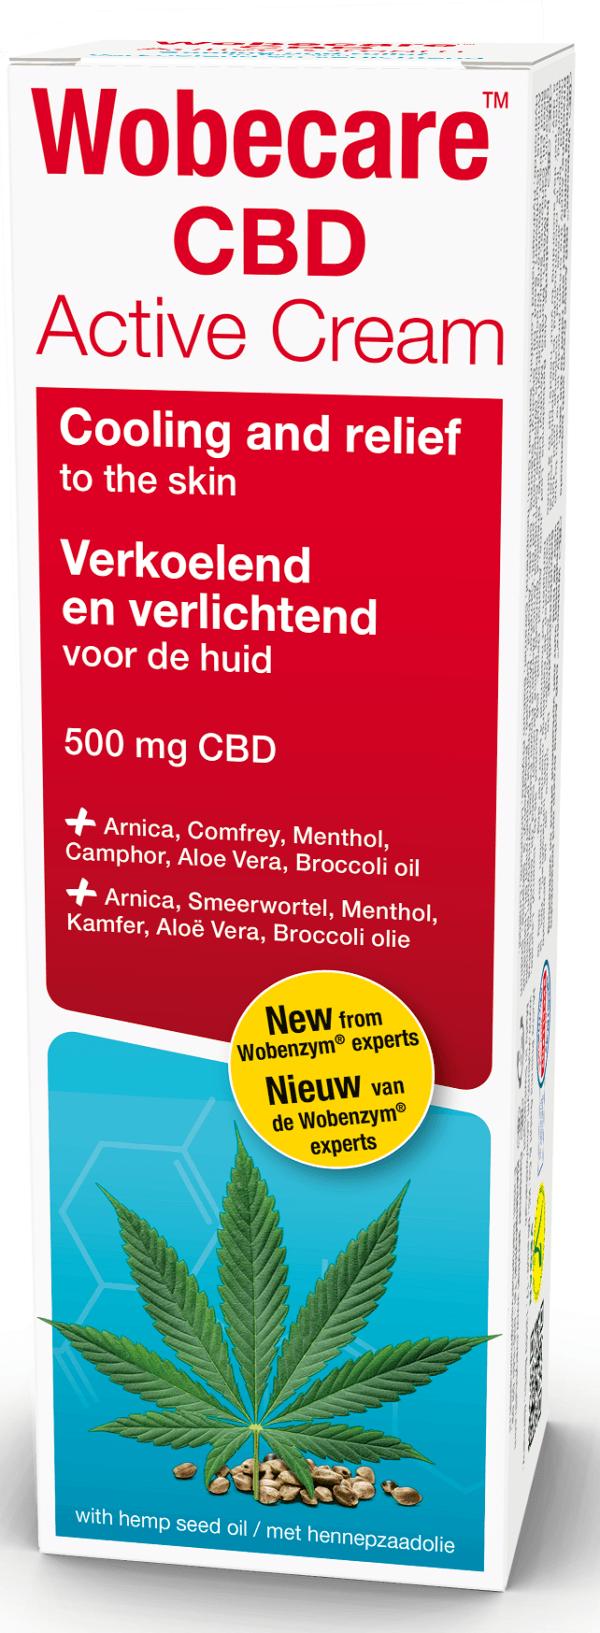 Wobecare CBD Active Cream 100 ml Wobenzym